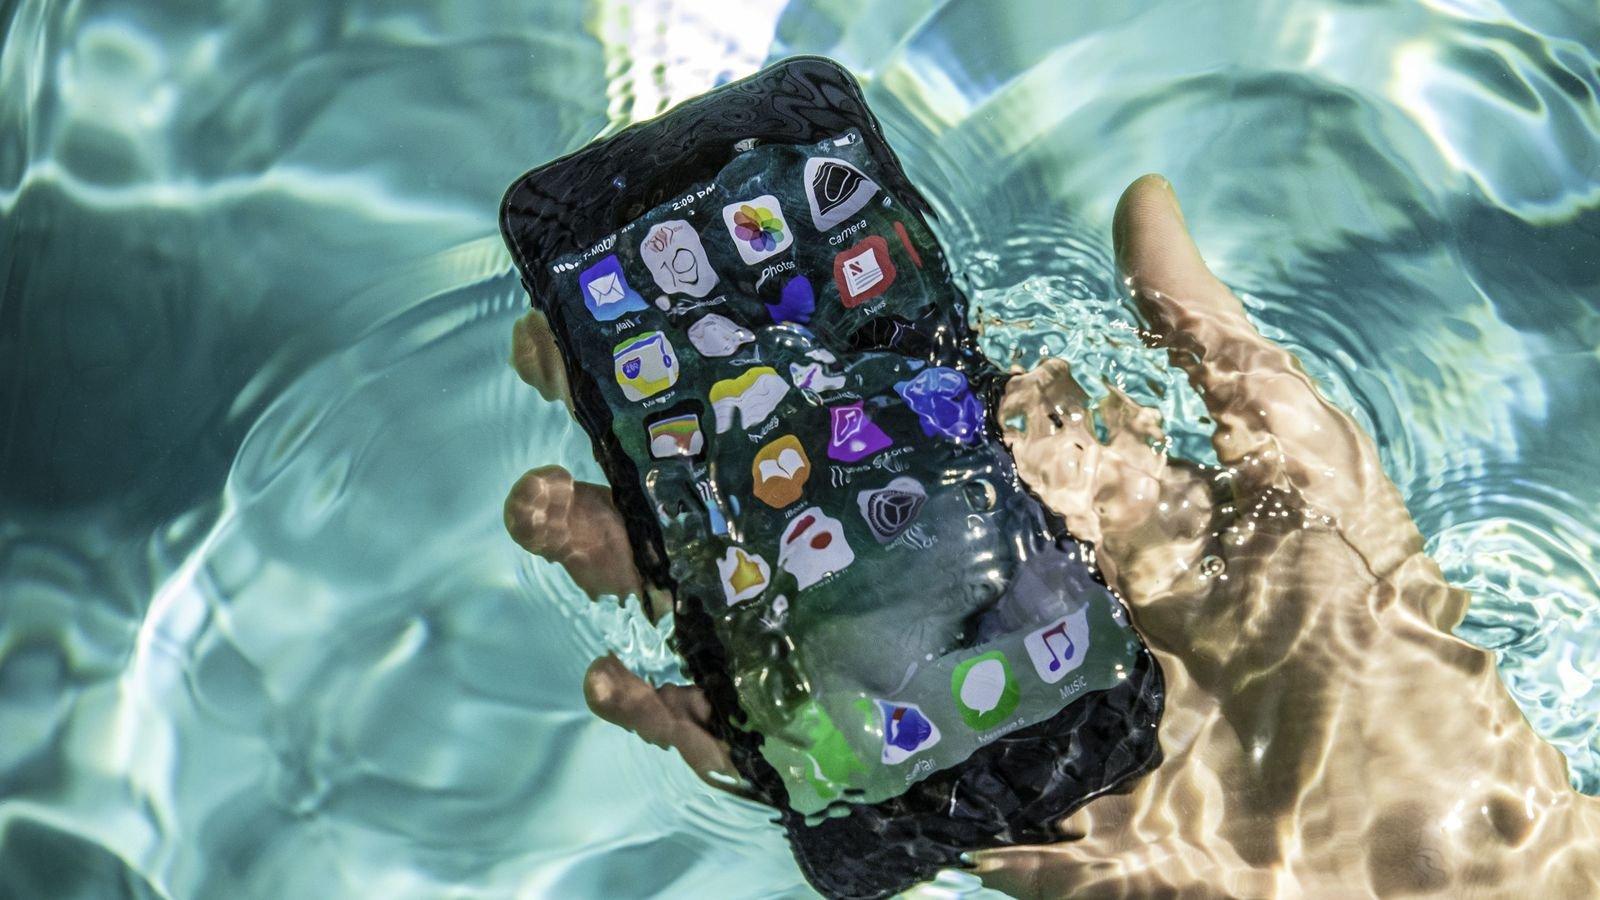 1496572368_iphone-7-pool-tests-water-splash-0071